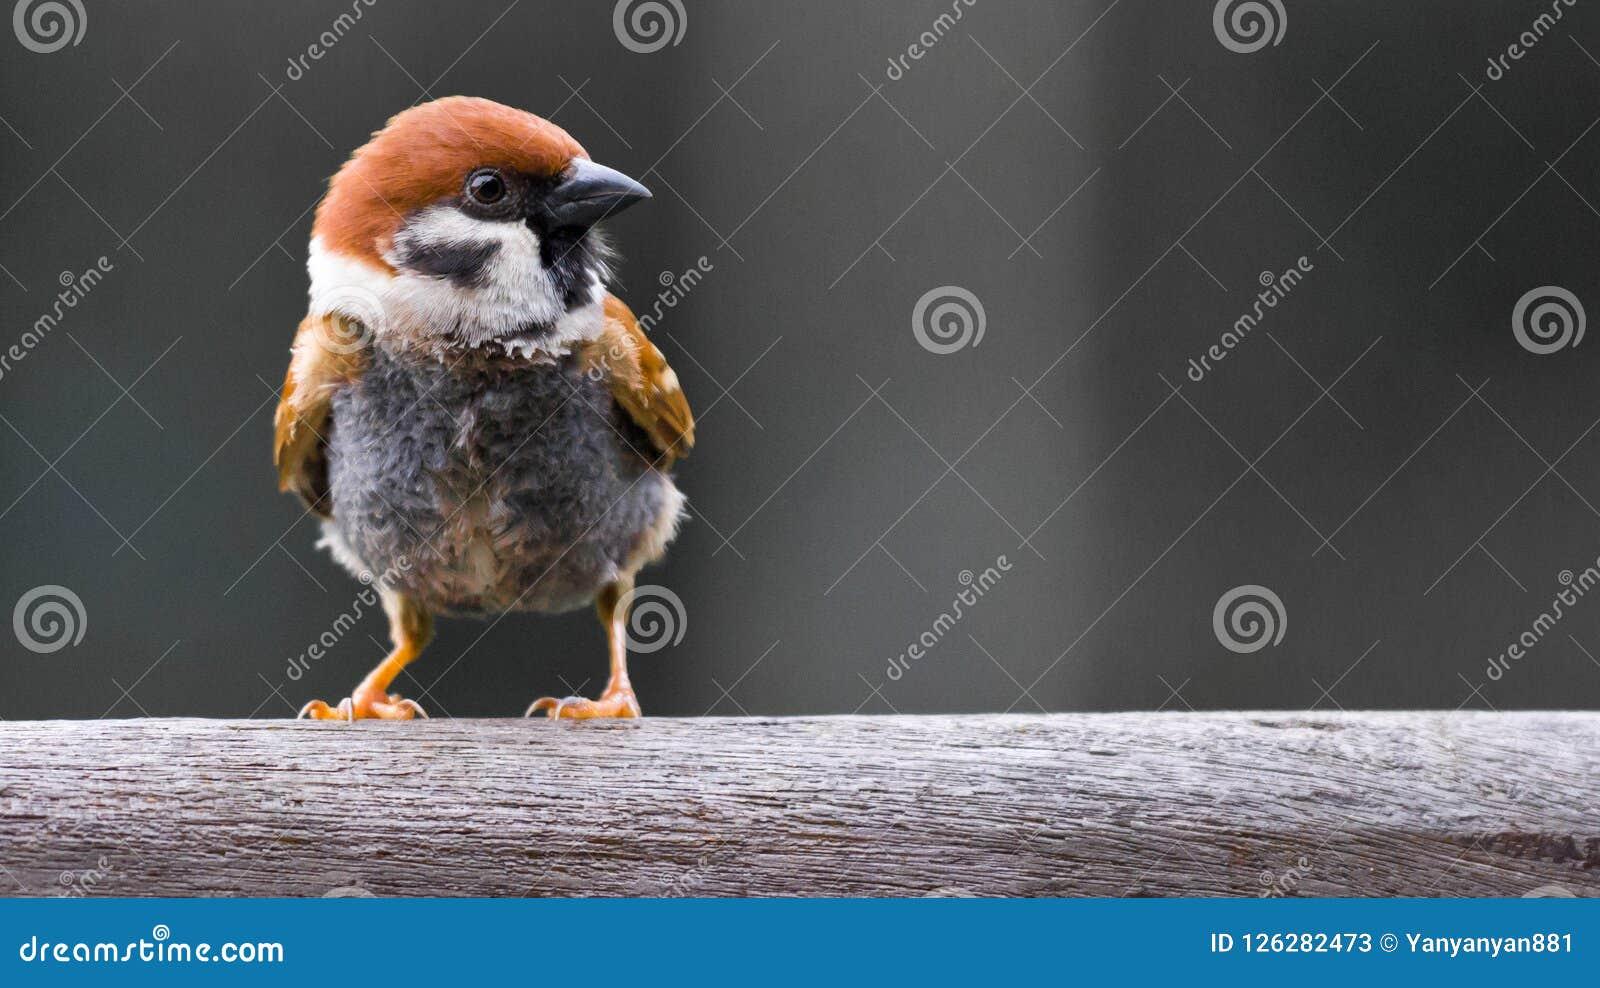 Close up of small bird